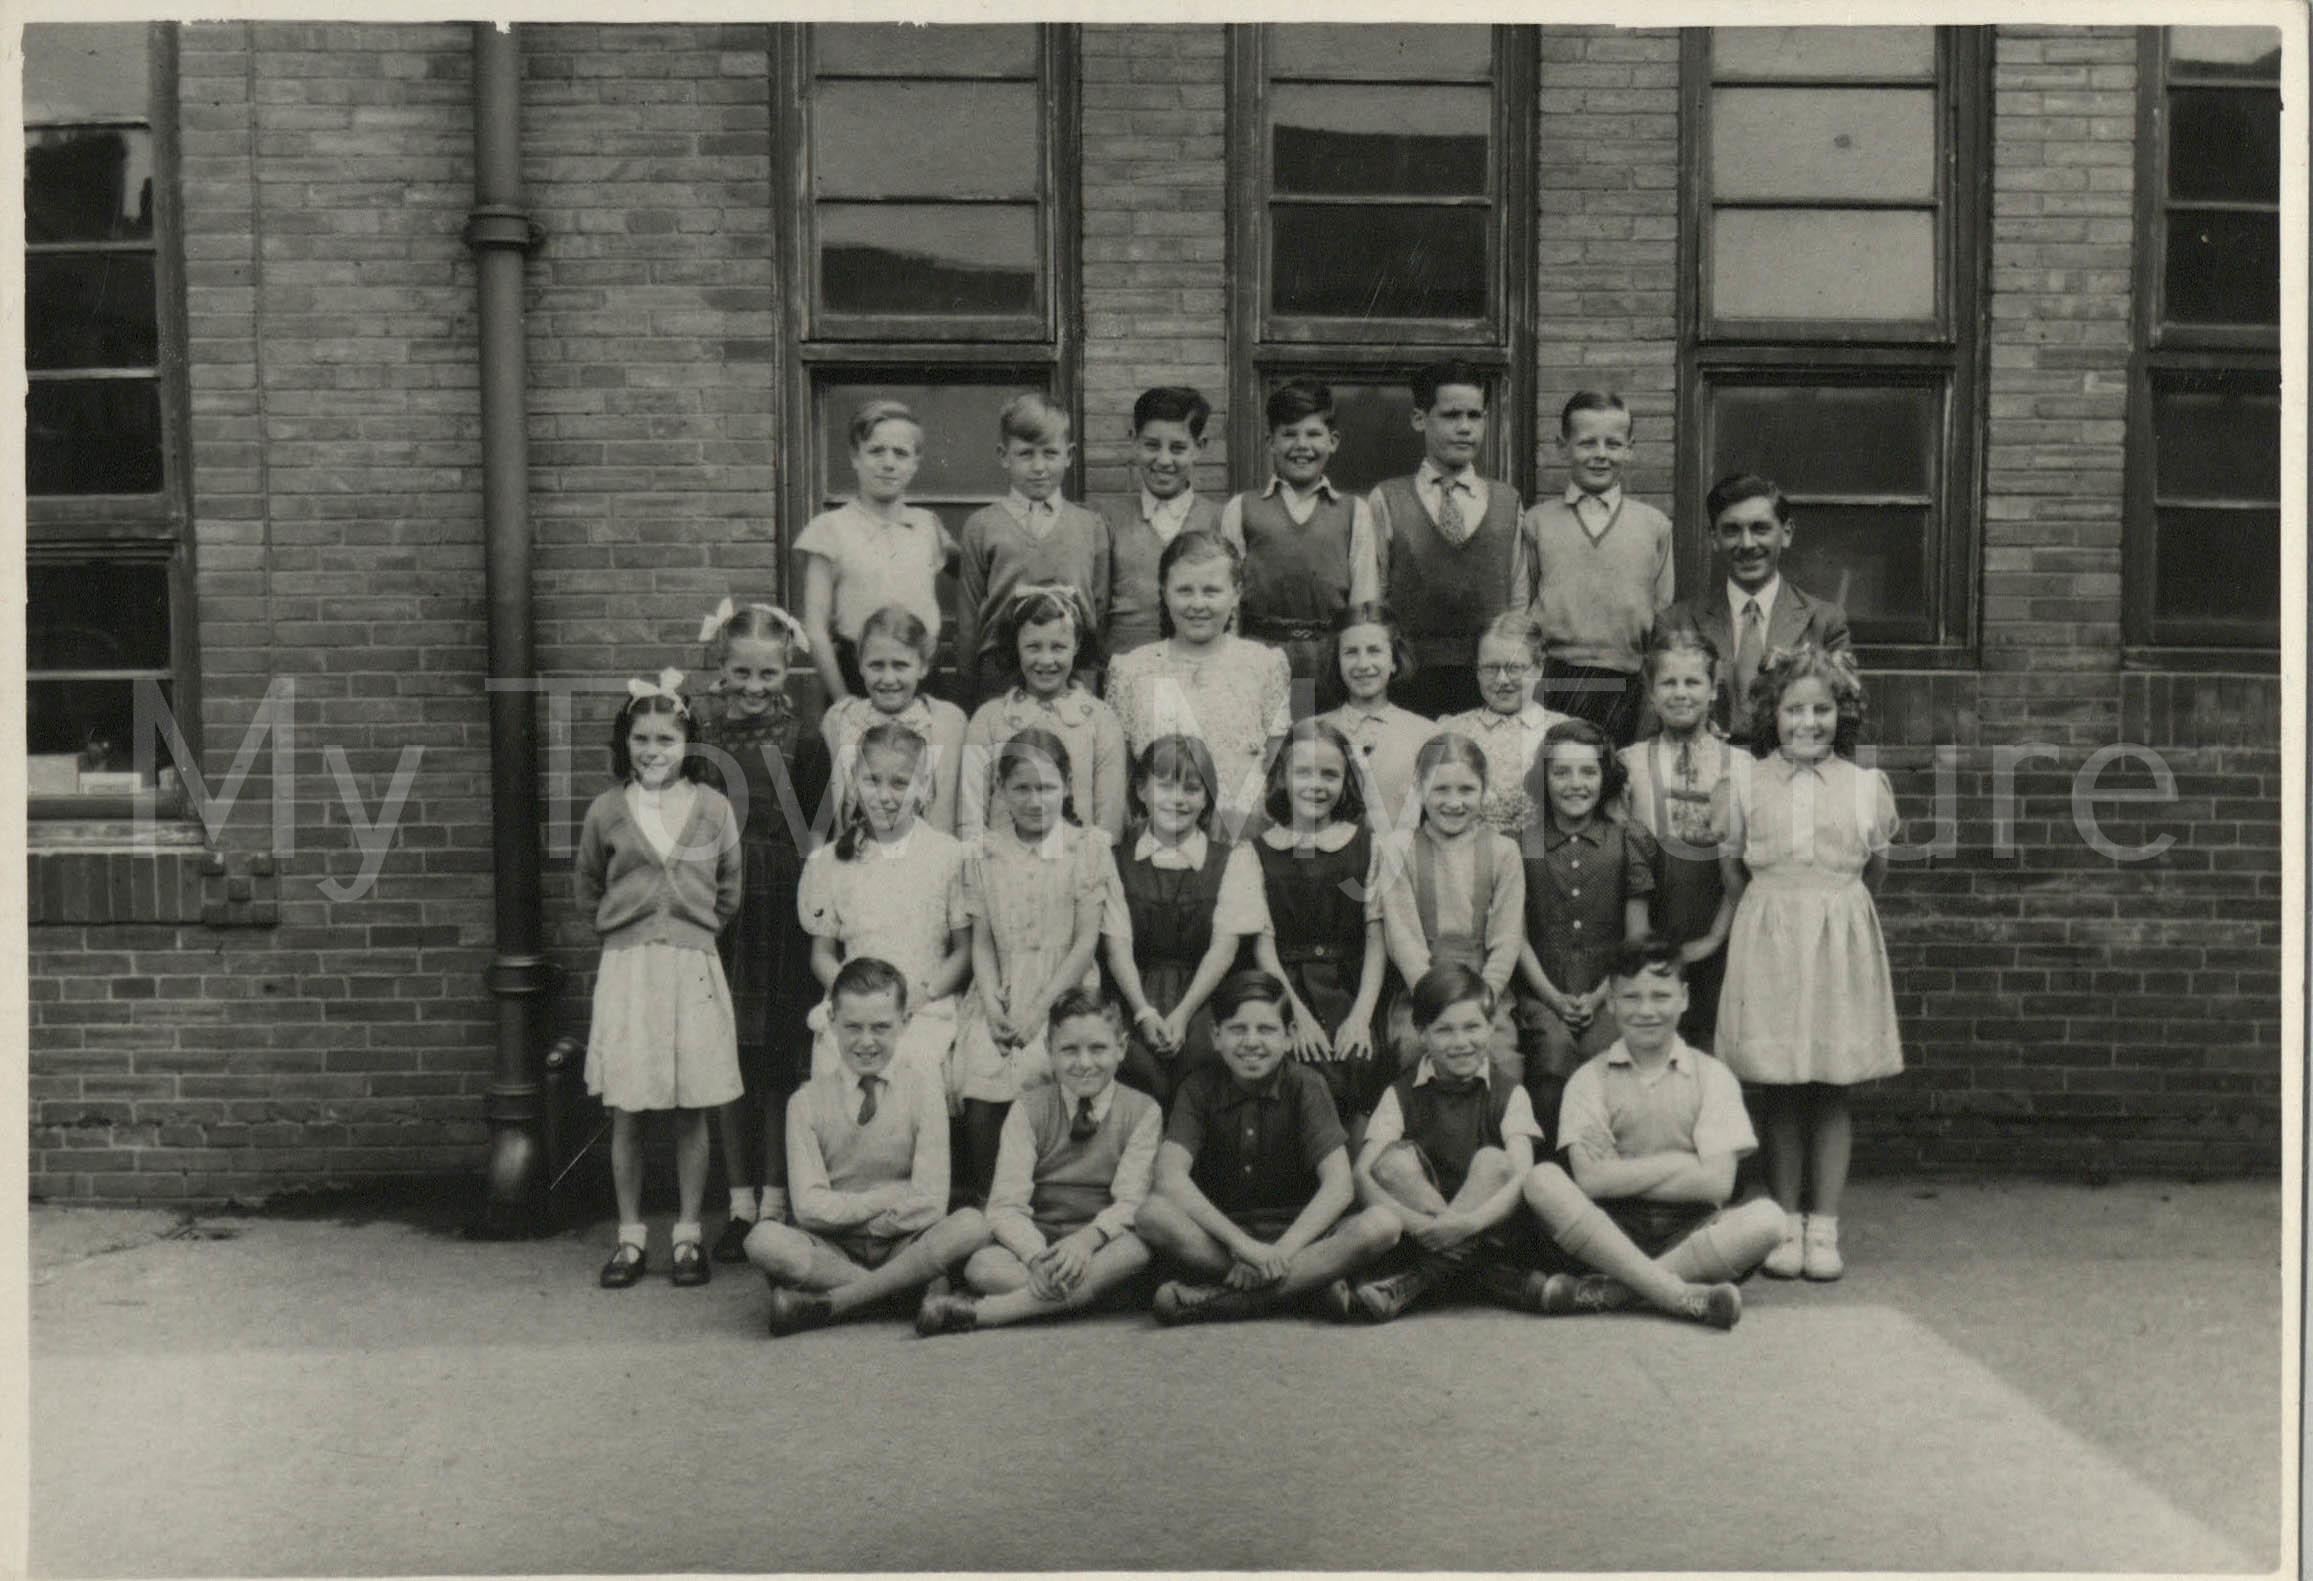 Fleetham Steet School (Mr Addison) 1950 -1951